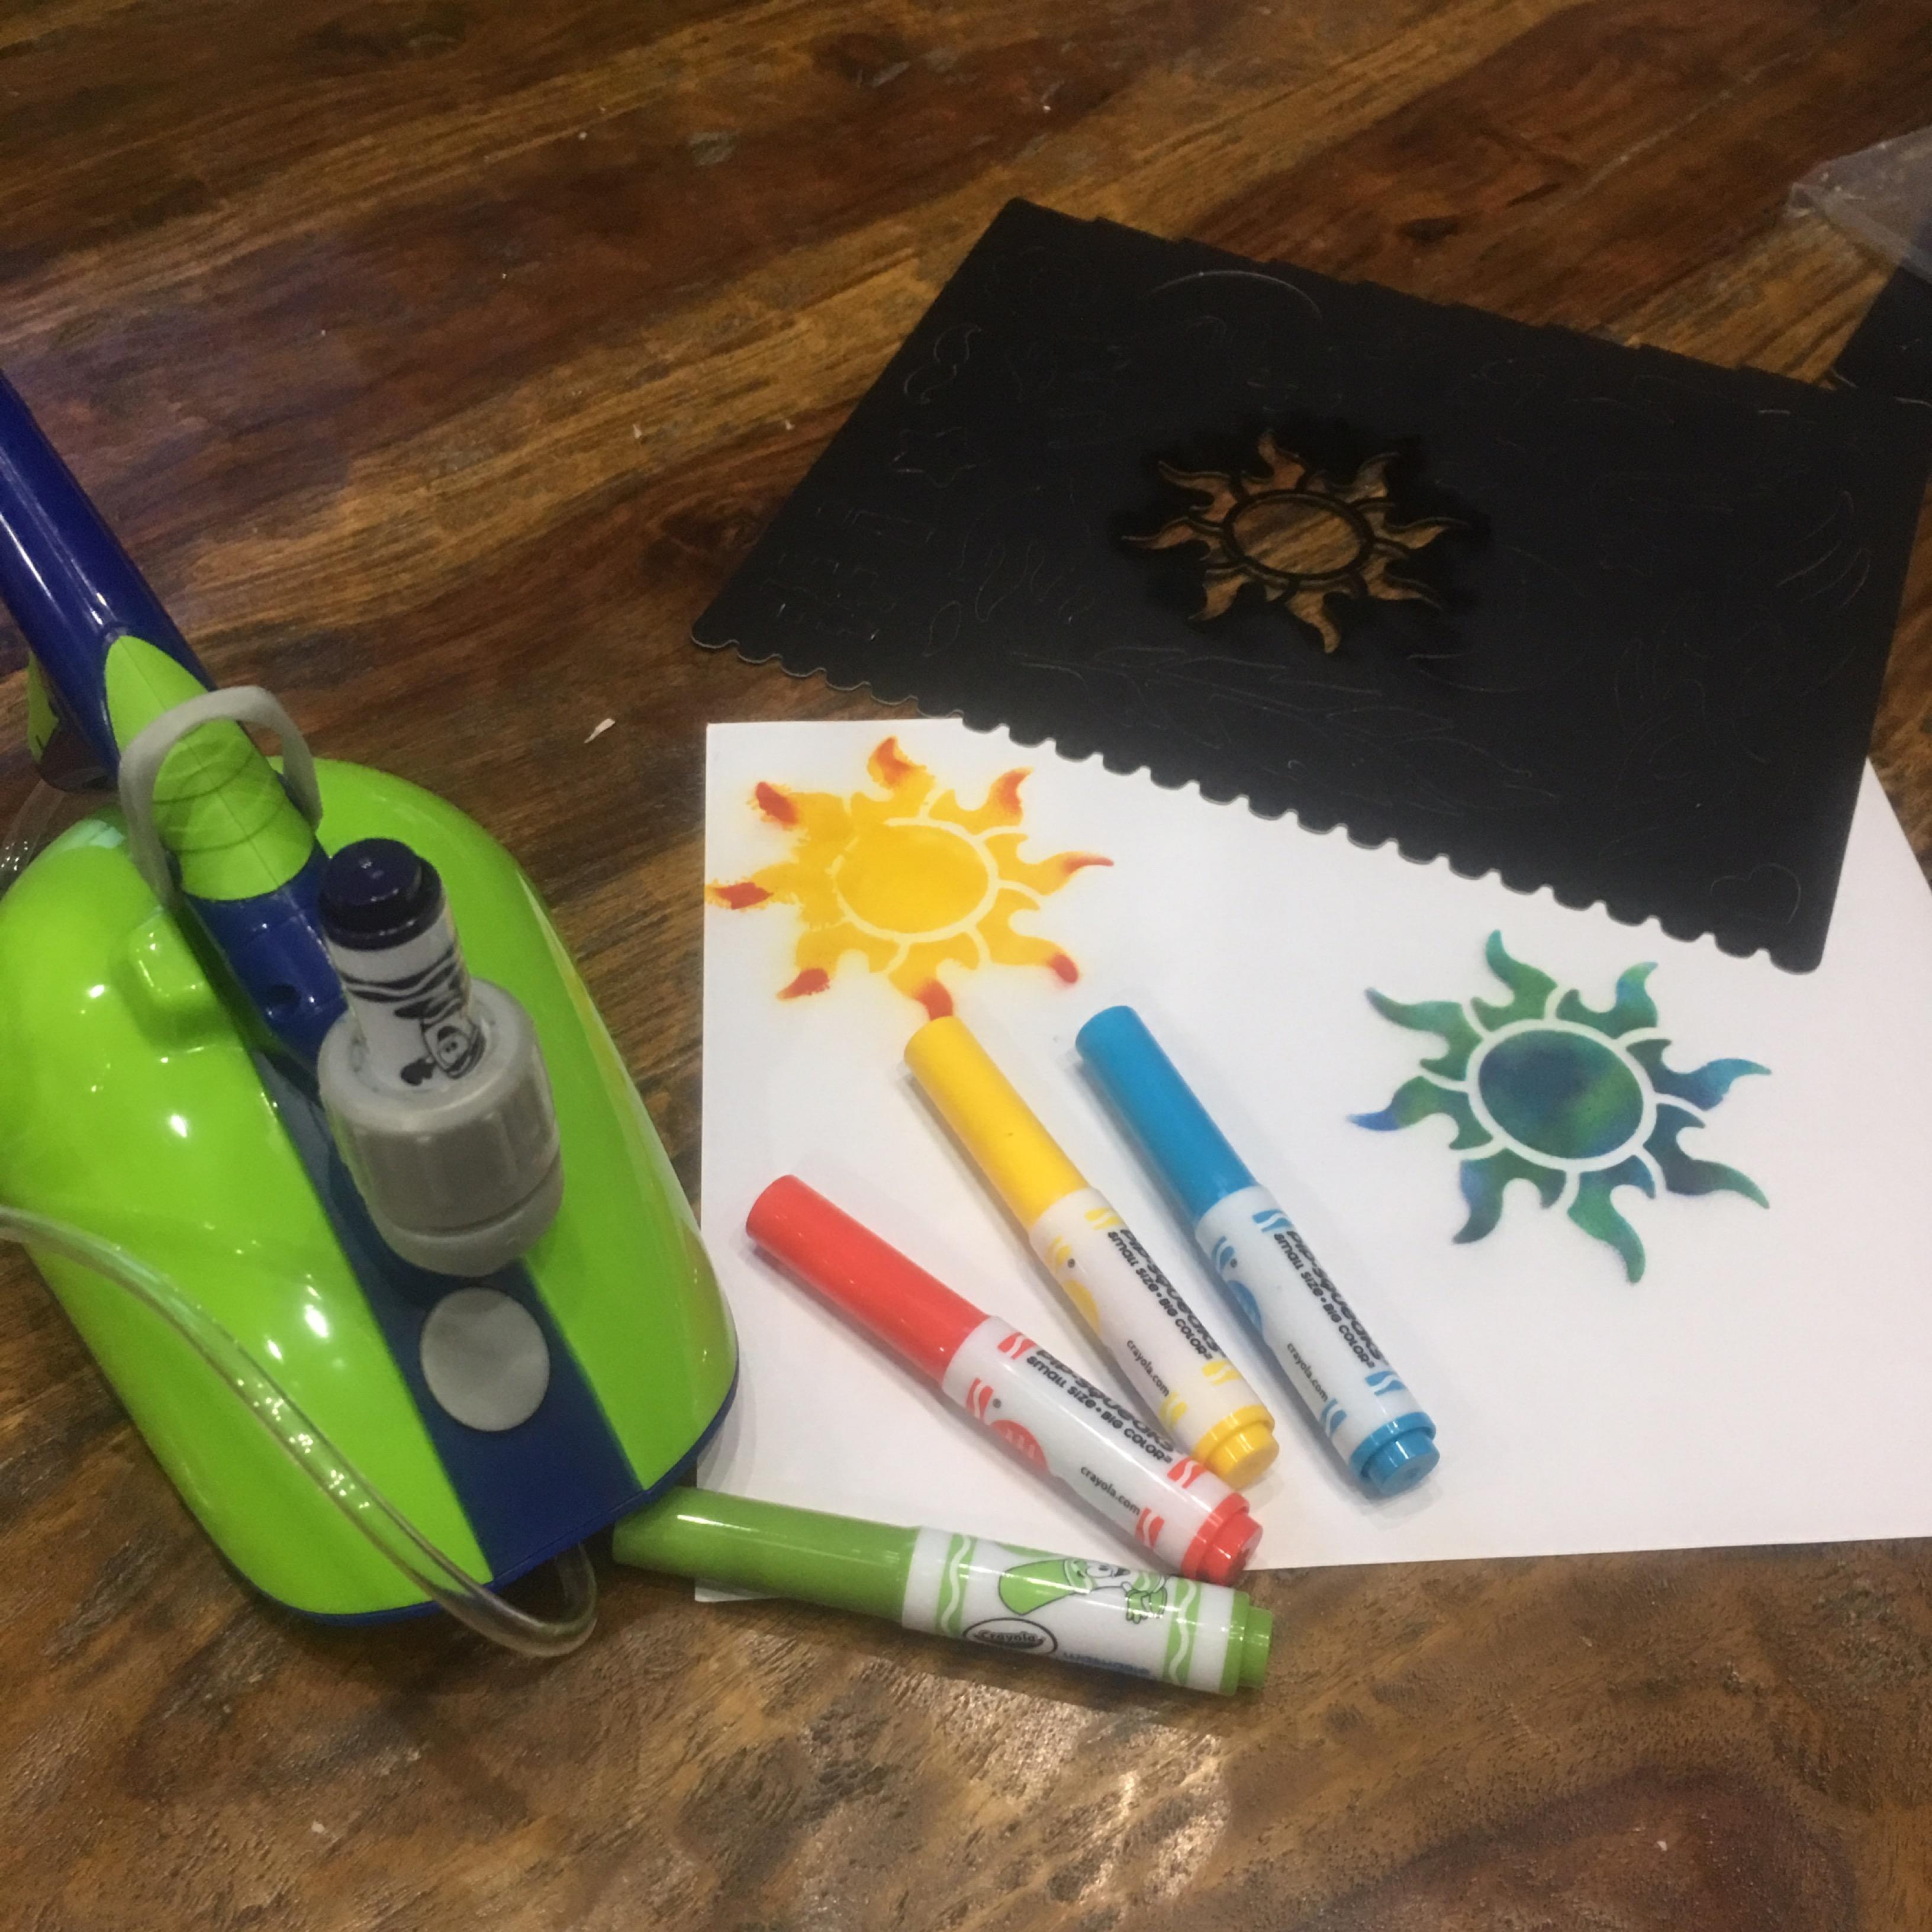 Make Your Own Spray Art Creation With Crayola Air Marker